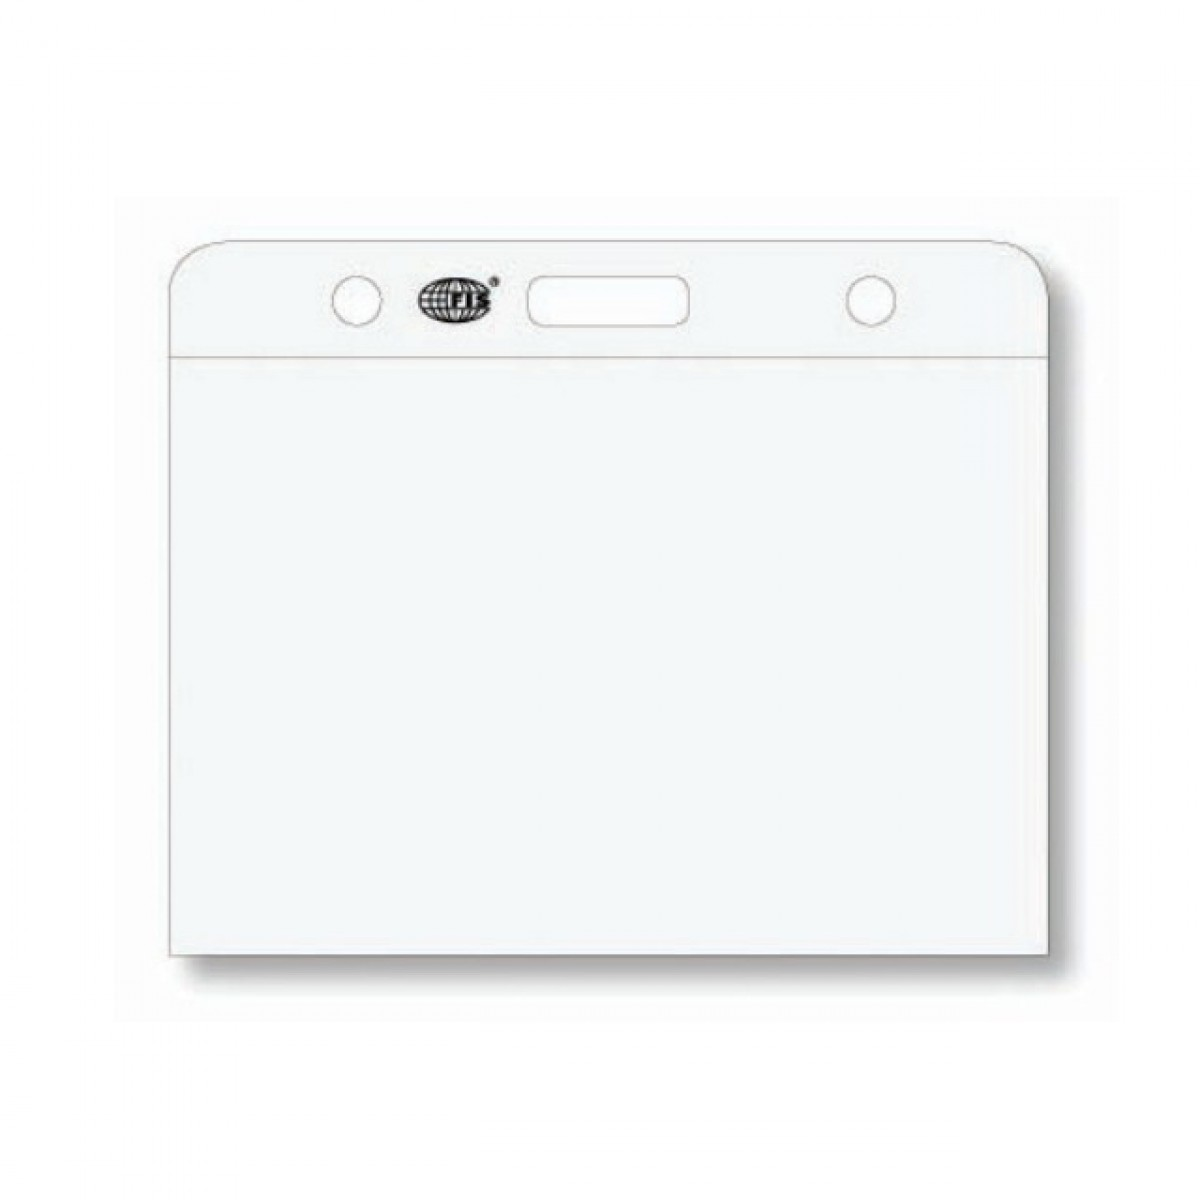 FIS Name Badge Holder 105 x 75mm FSNC105X75 - Transparent (box/50pcs)